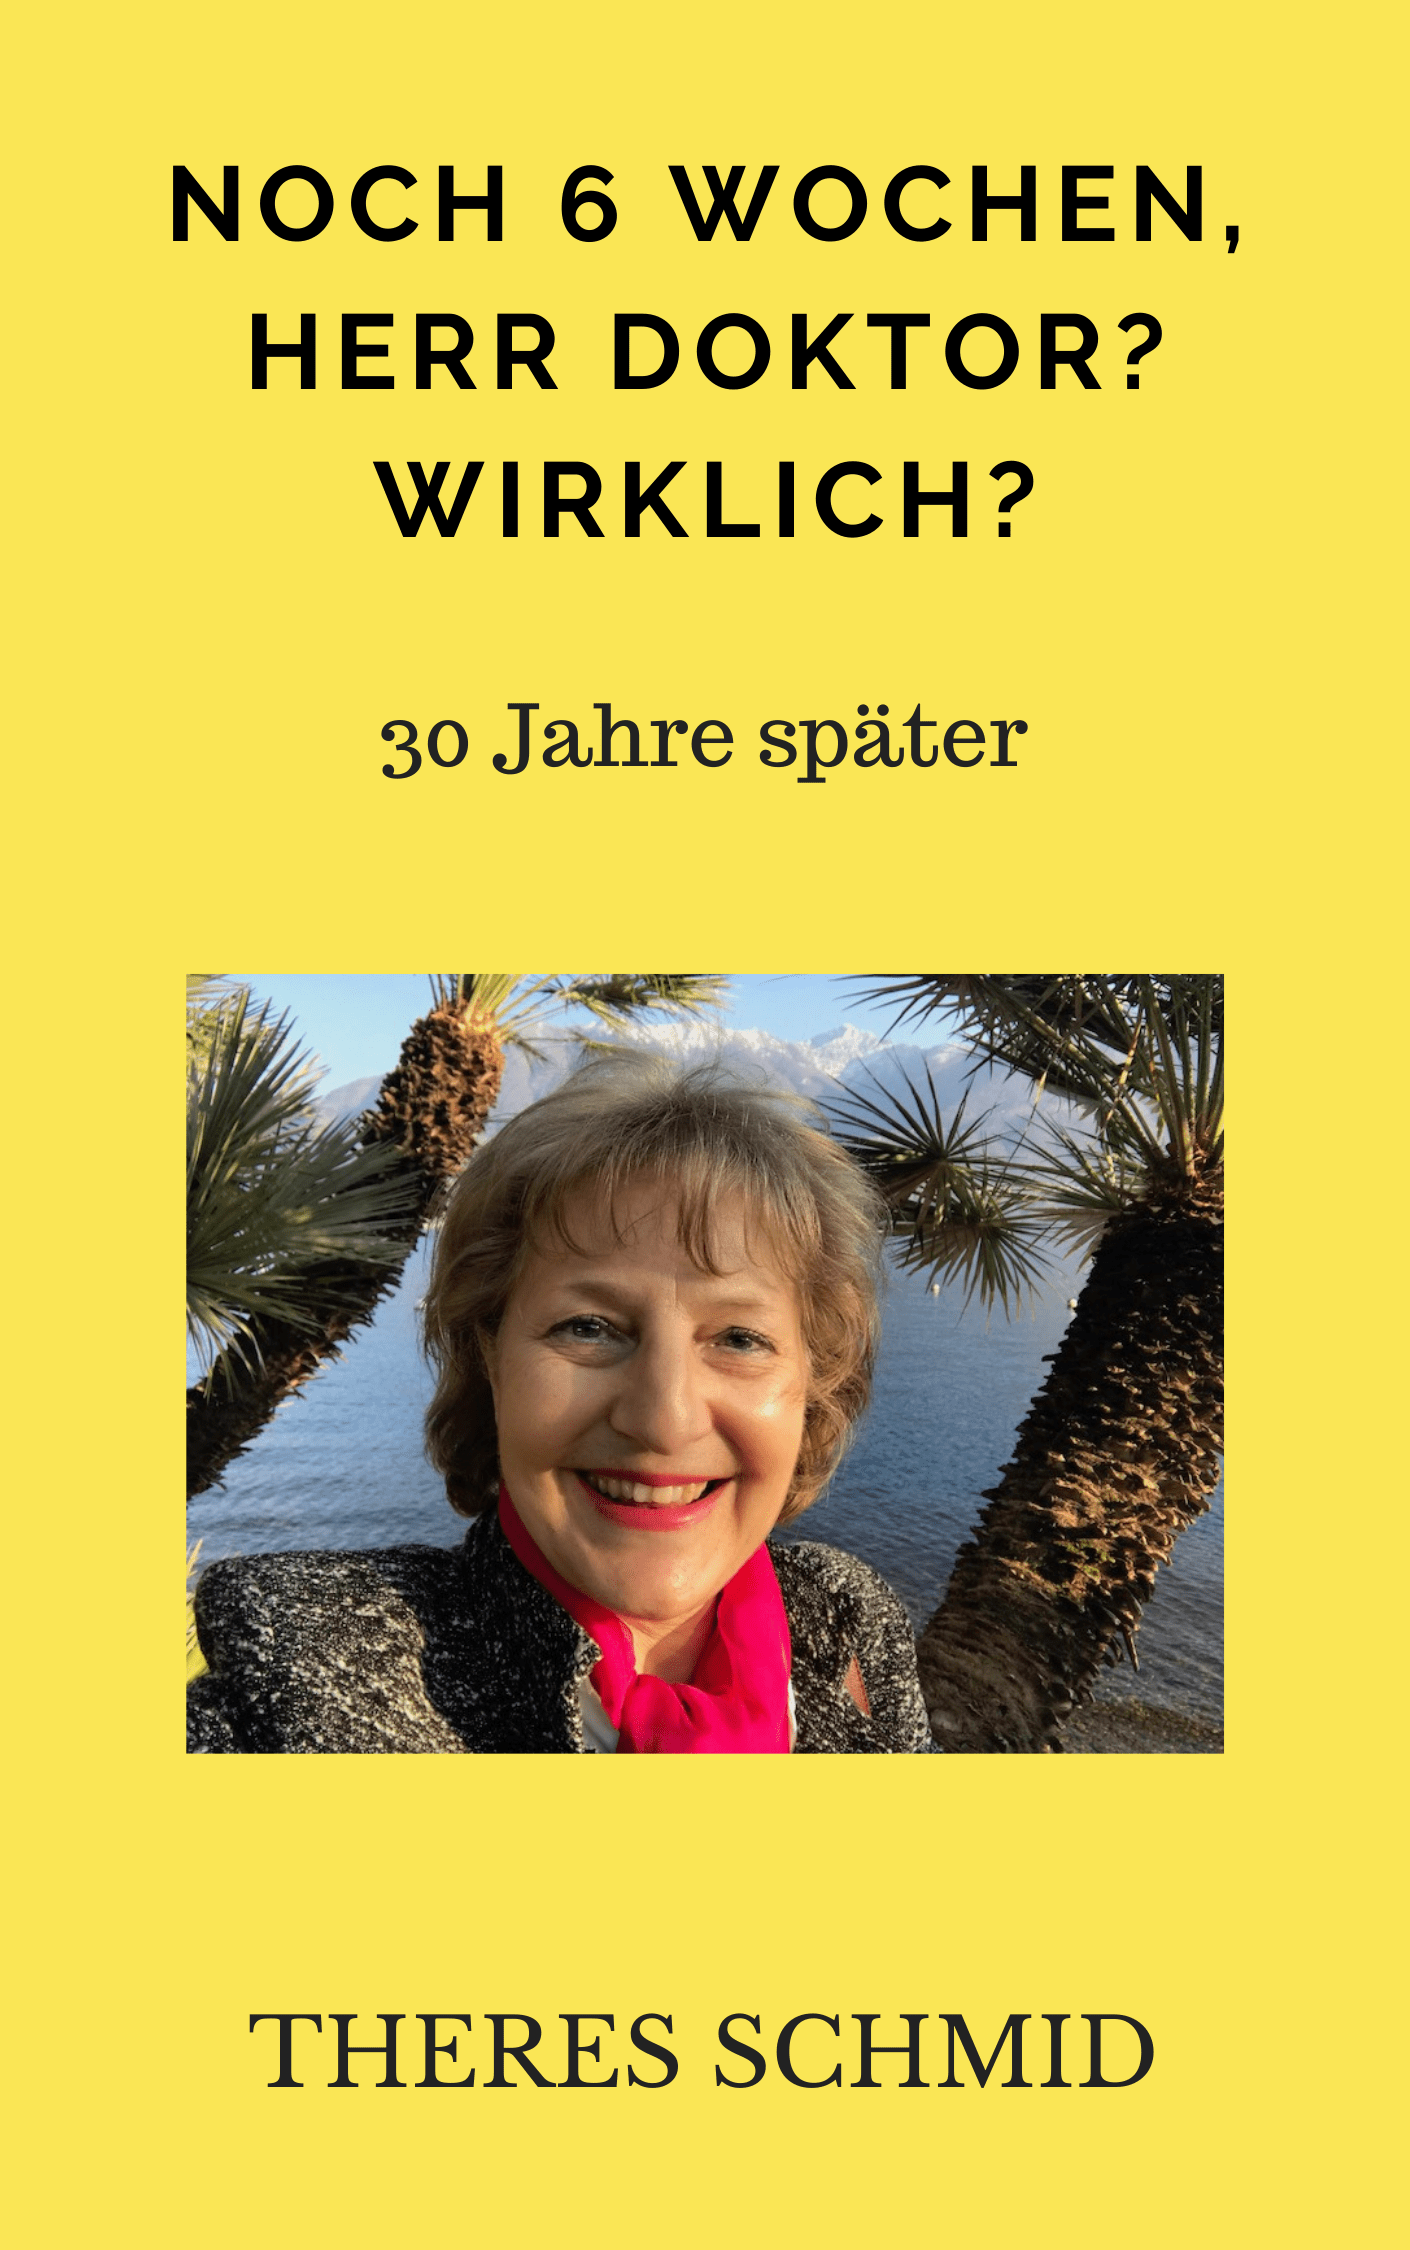 Theres Schmid - Buch Noch 6 Wochen